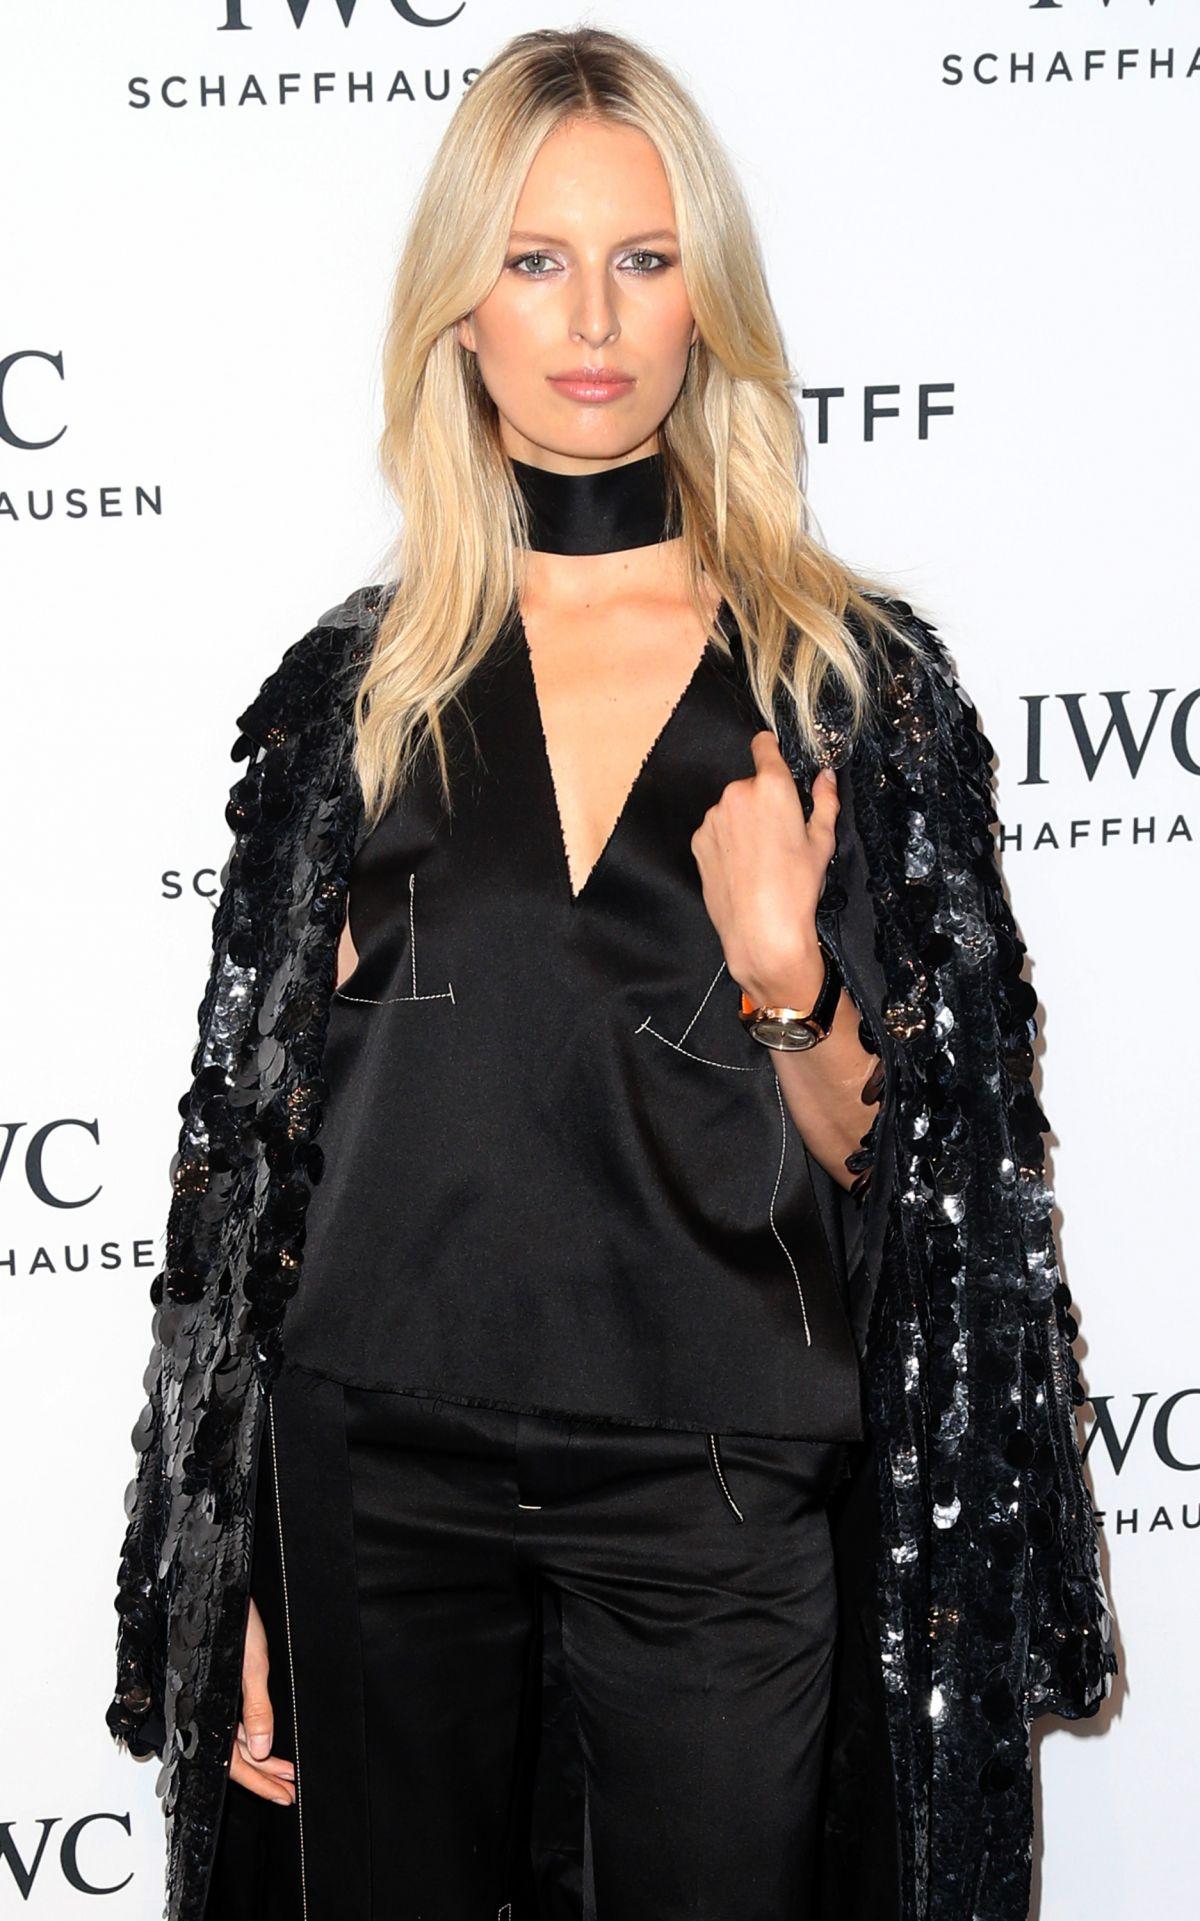 KAROLINA KURKOVA at IWC Schaffhausen for the Love of Cinema Dinner at Tribeca Film Fest in New York 04/14/2016